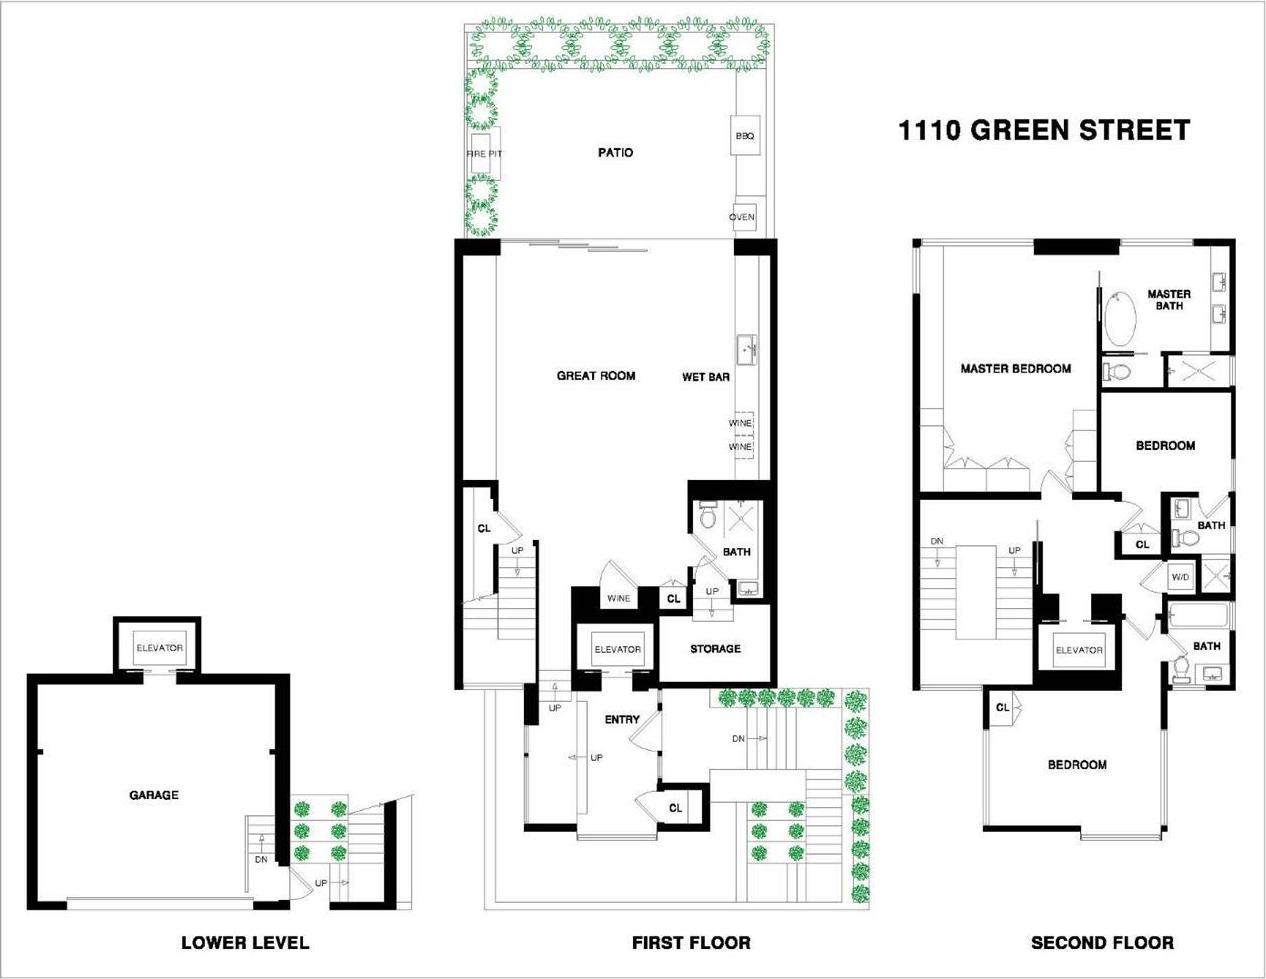 1110 Green St photo